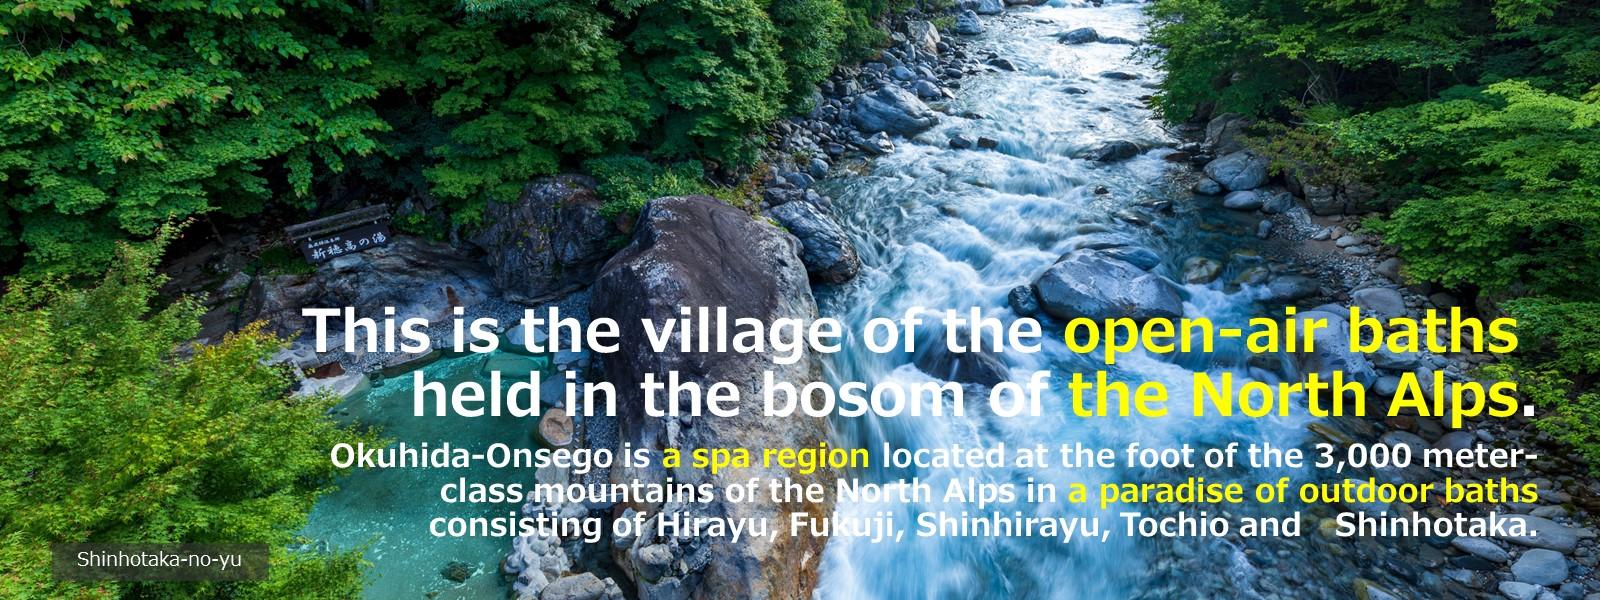 Okuhida-onsengo | Shinhotaka-no-yu